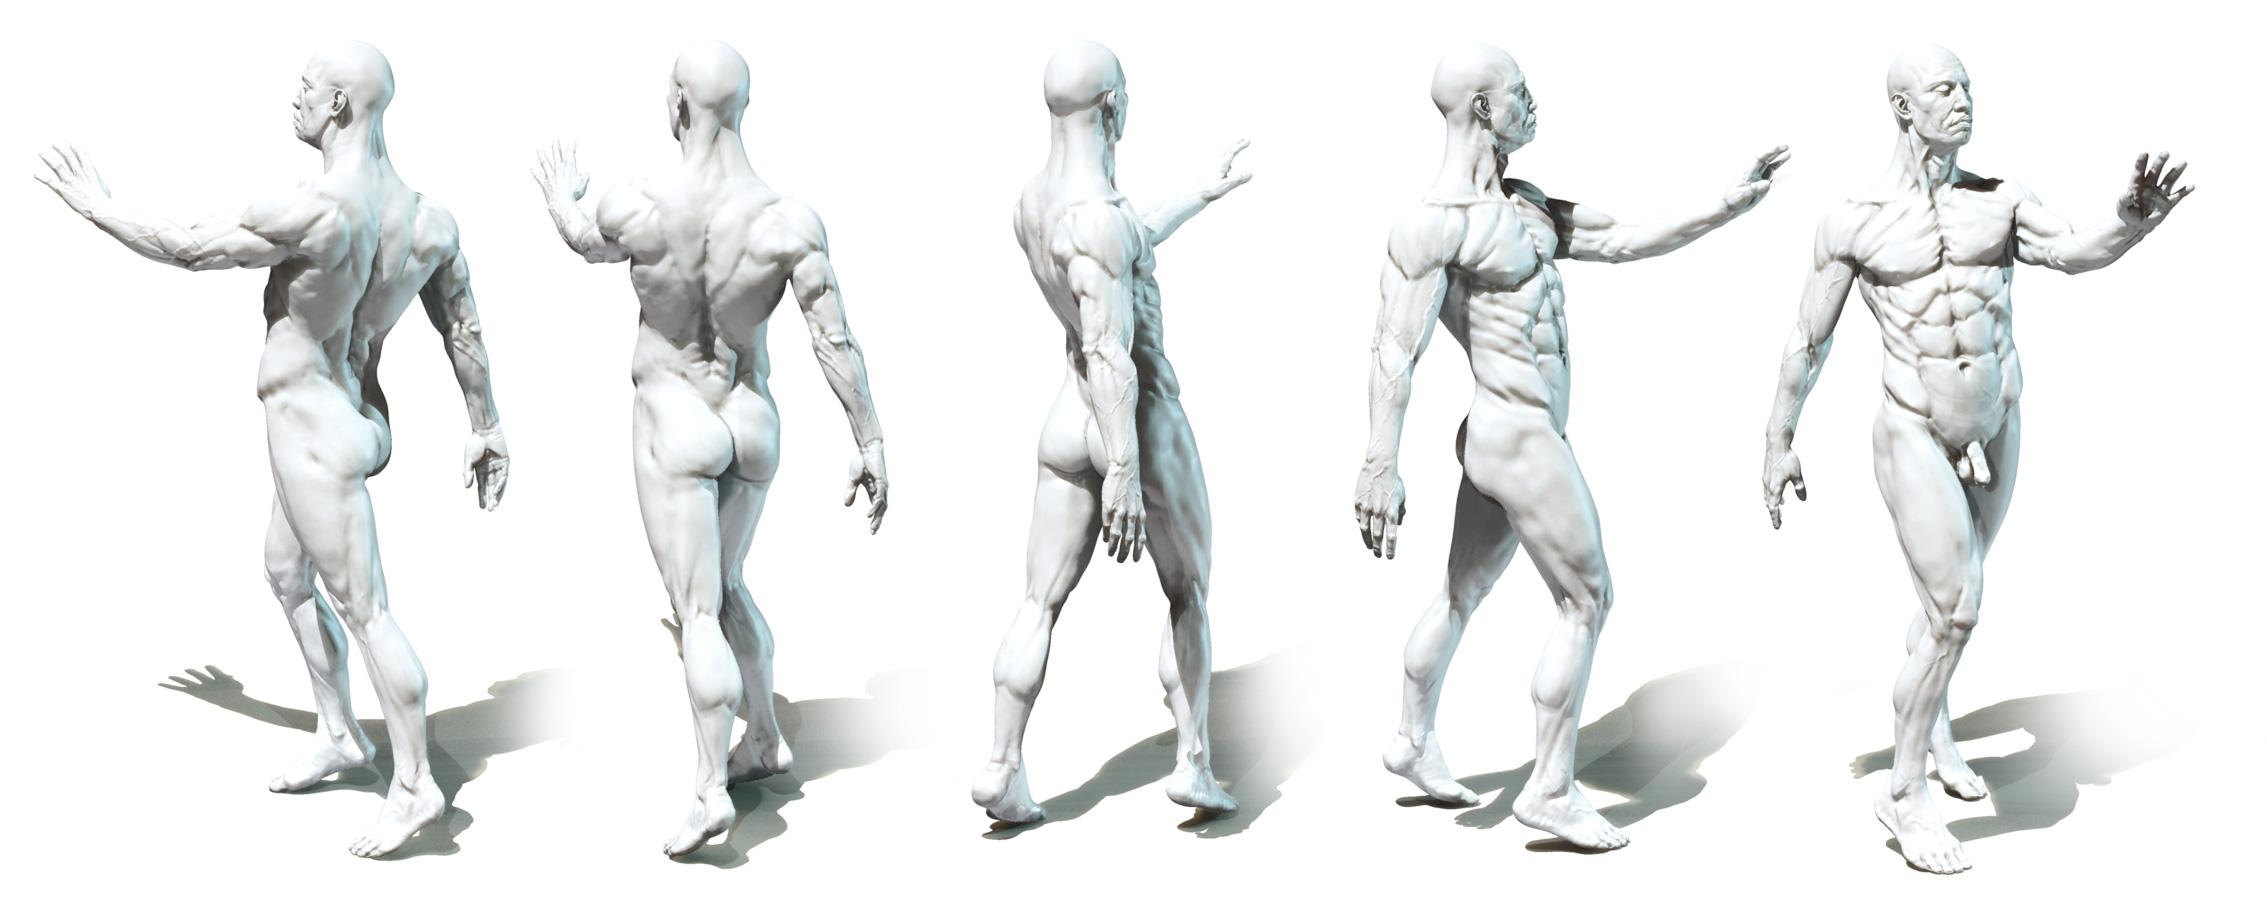 Anatomy Of Art Choice Image - human body anatomy